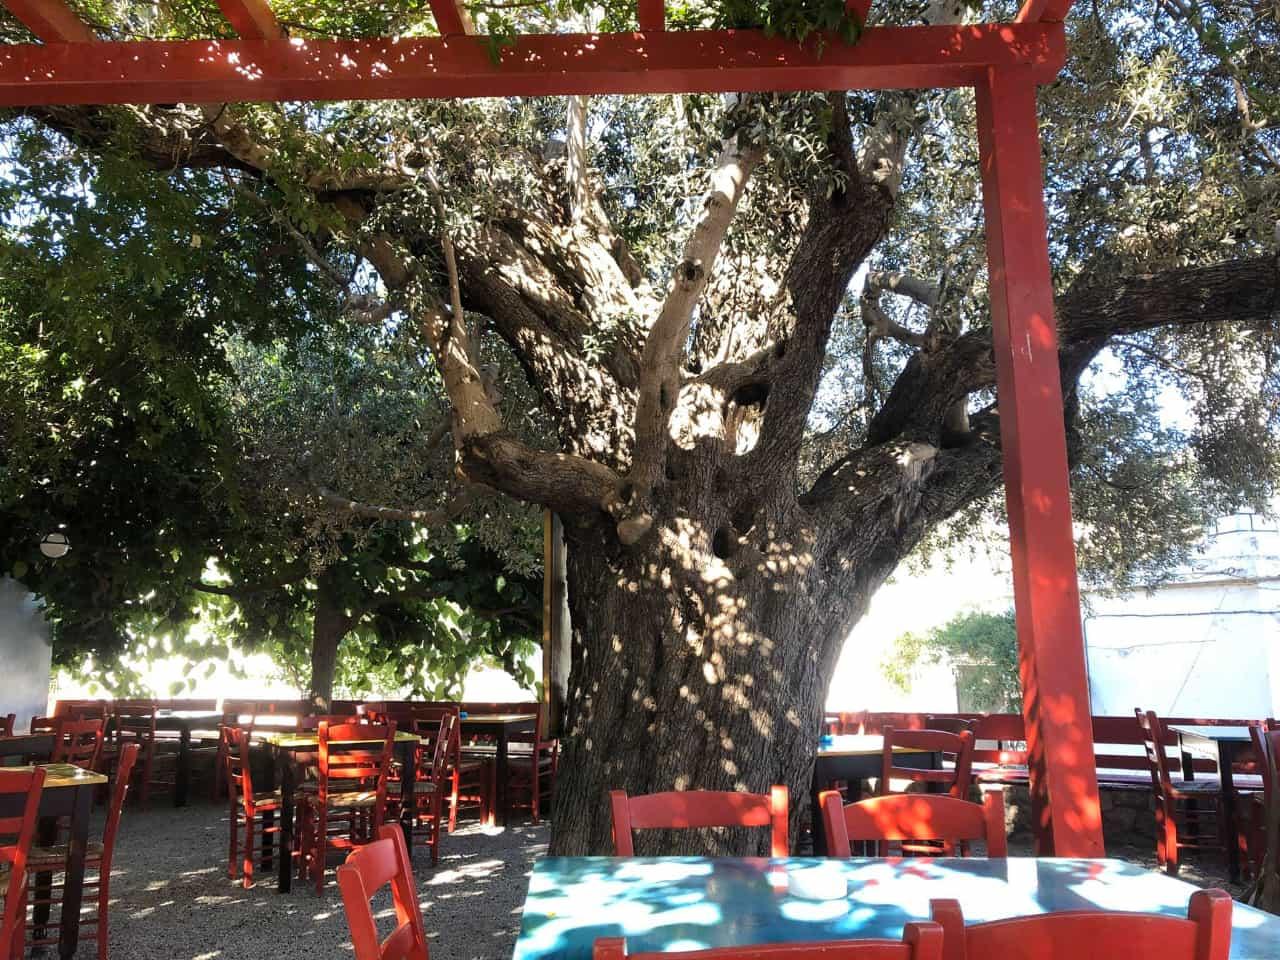 Paleo scolio anidri village, old school anidri village paleochora, eatery restaurant paleo scolio